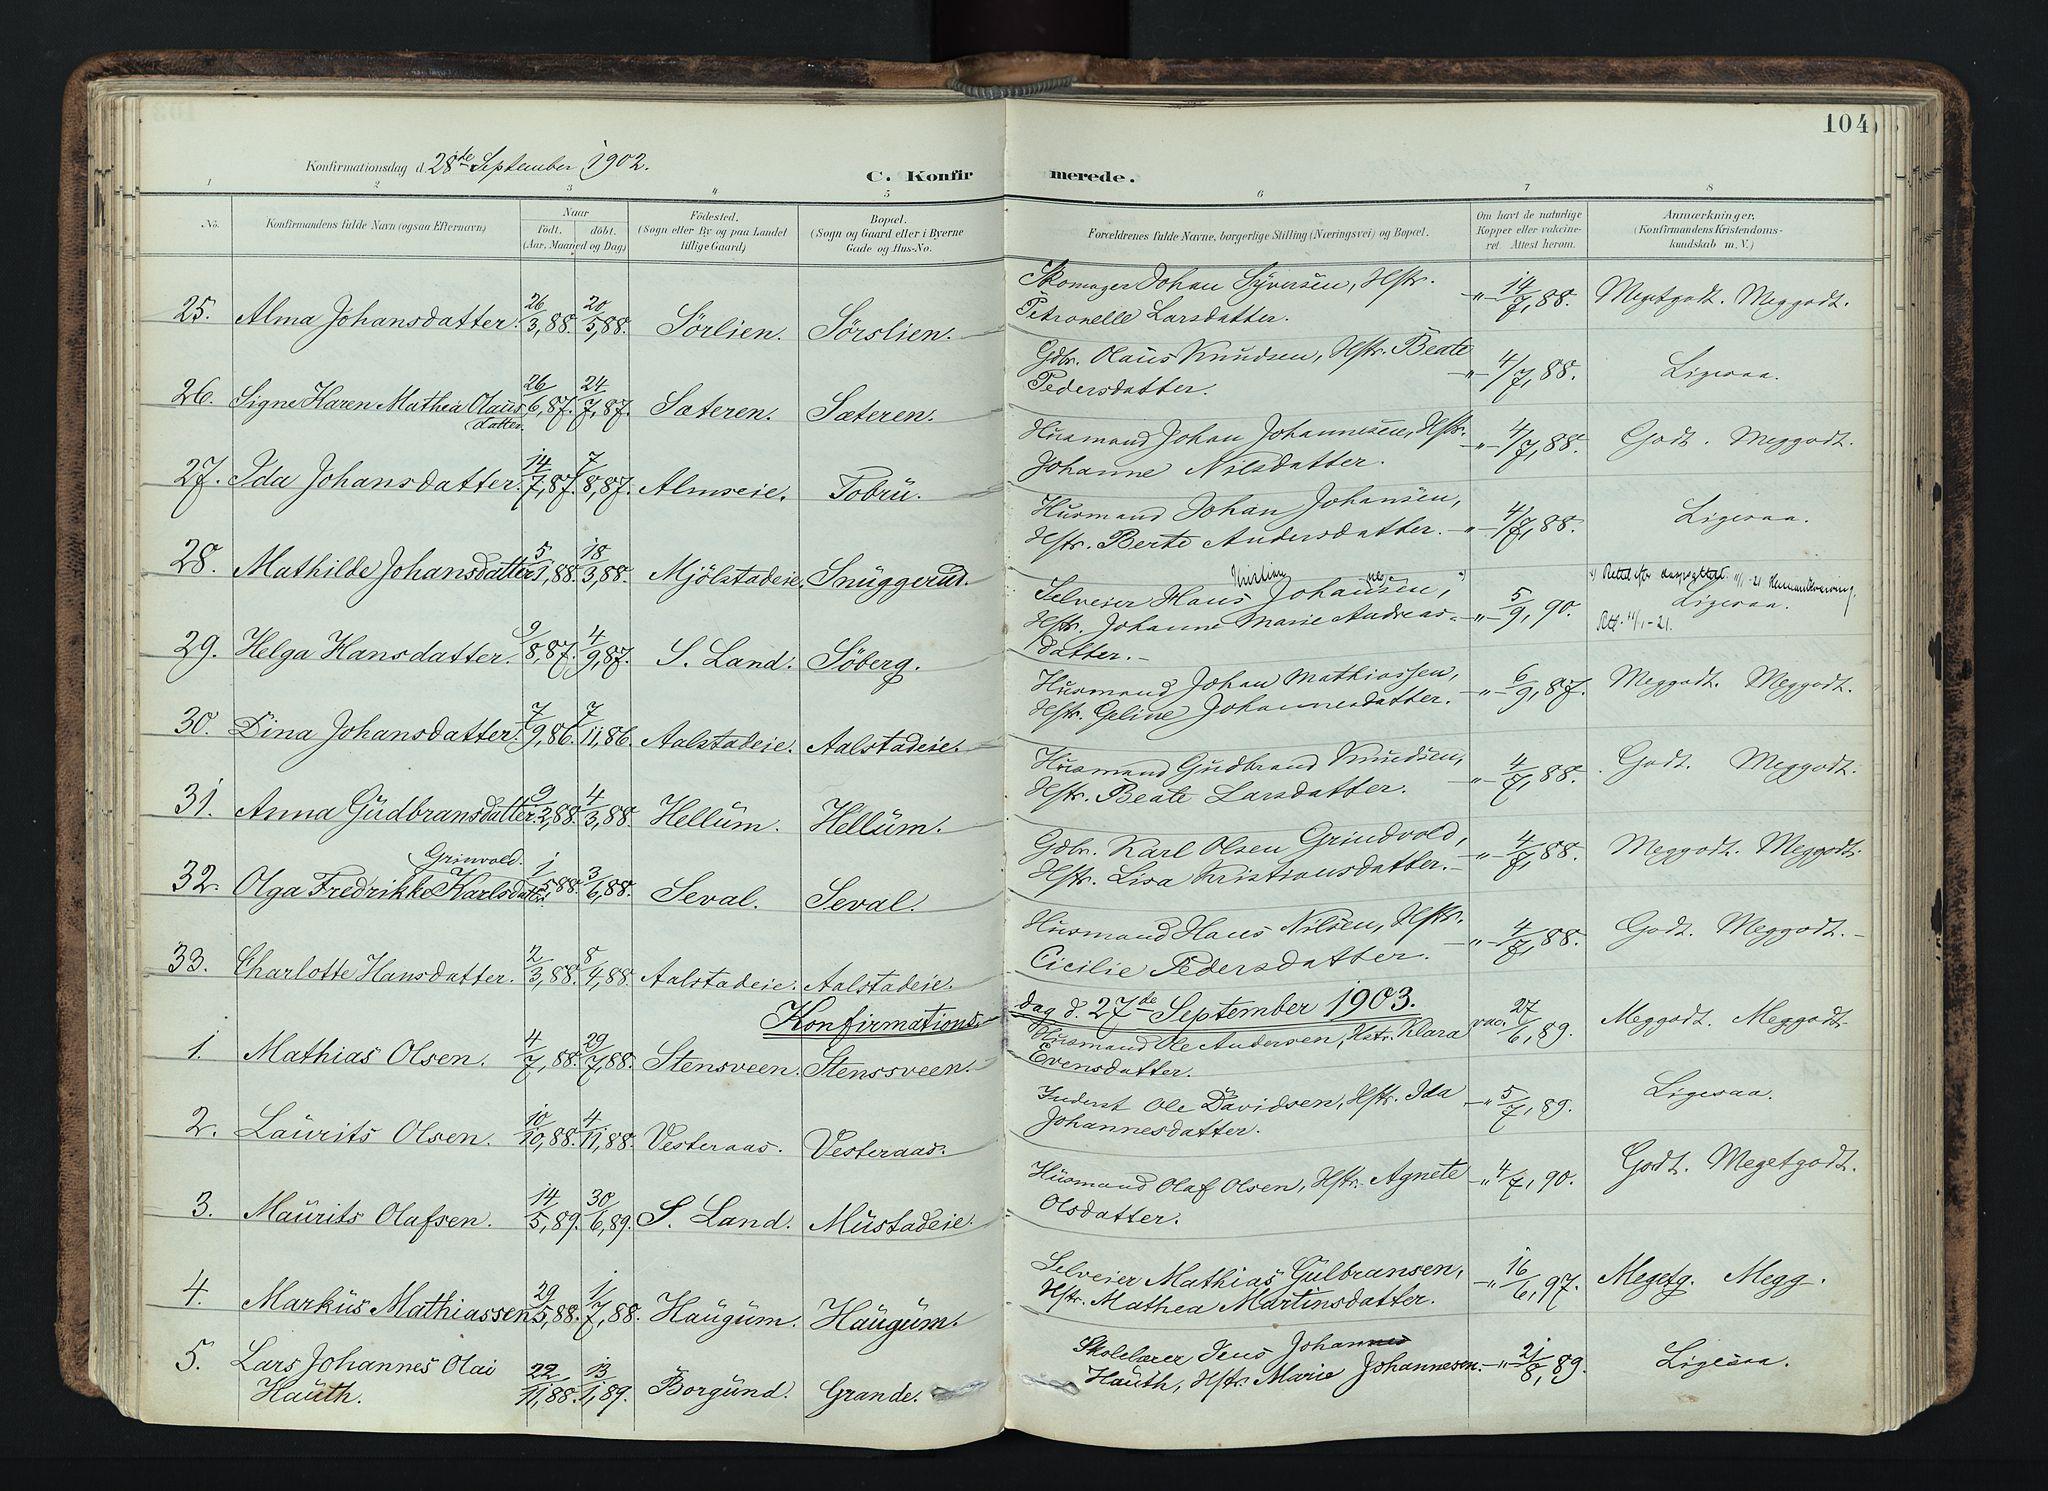 SAH, Vardal prestekontor, H/Ha/Haa/L0019: Ministerialbok nr. 19, 1893-1907, s. 104